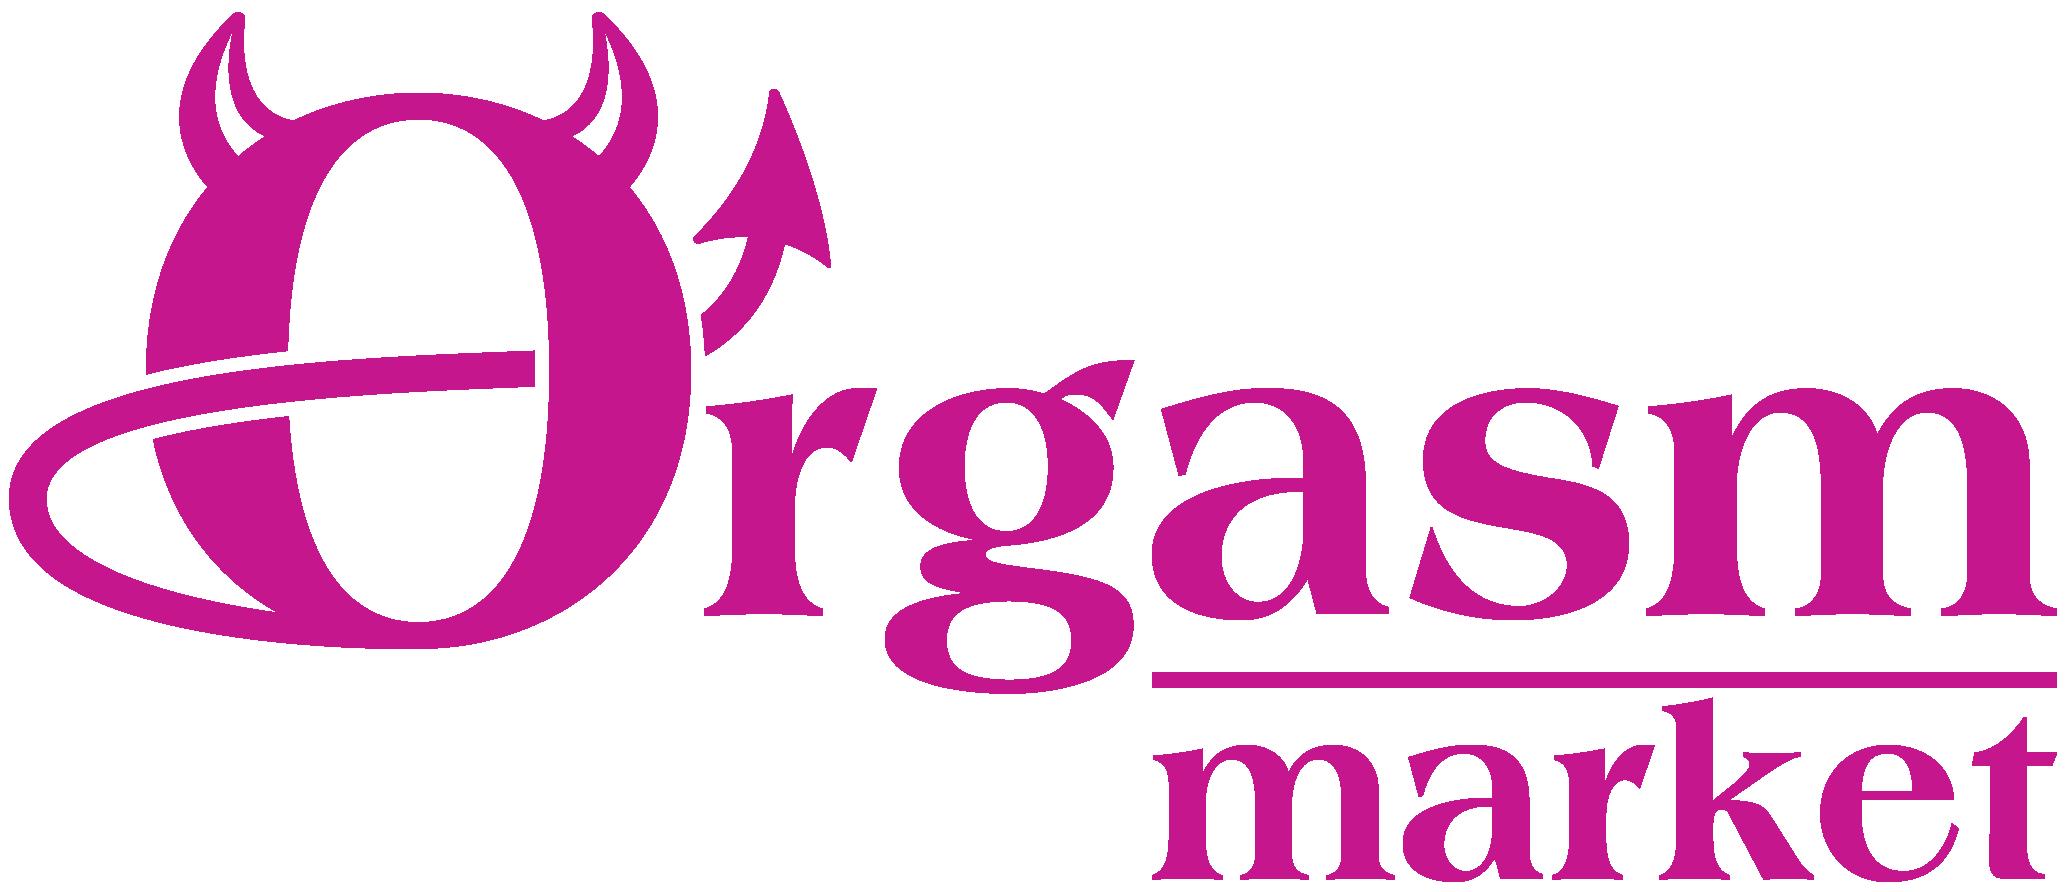 Orgasm Market